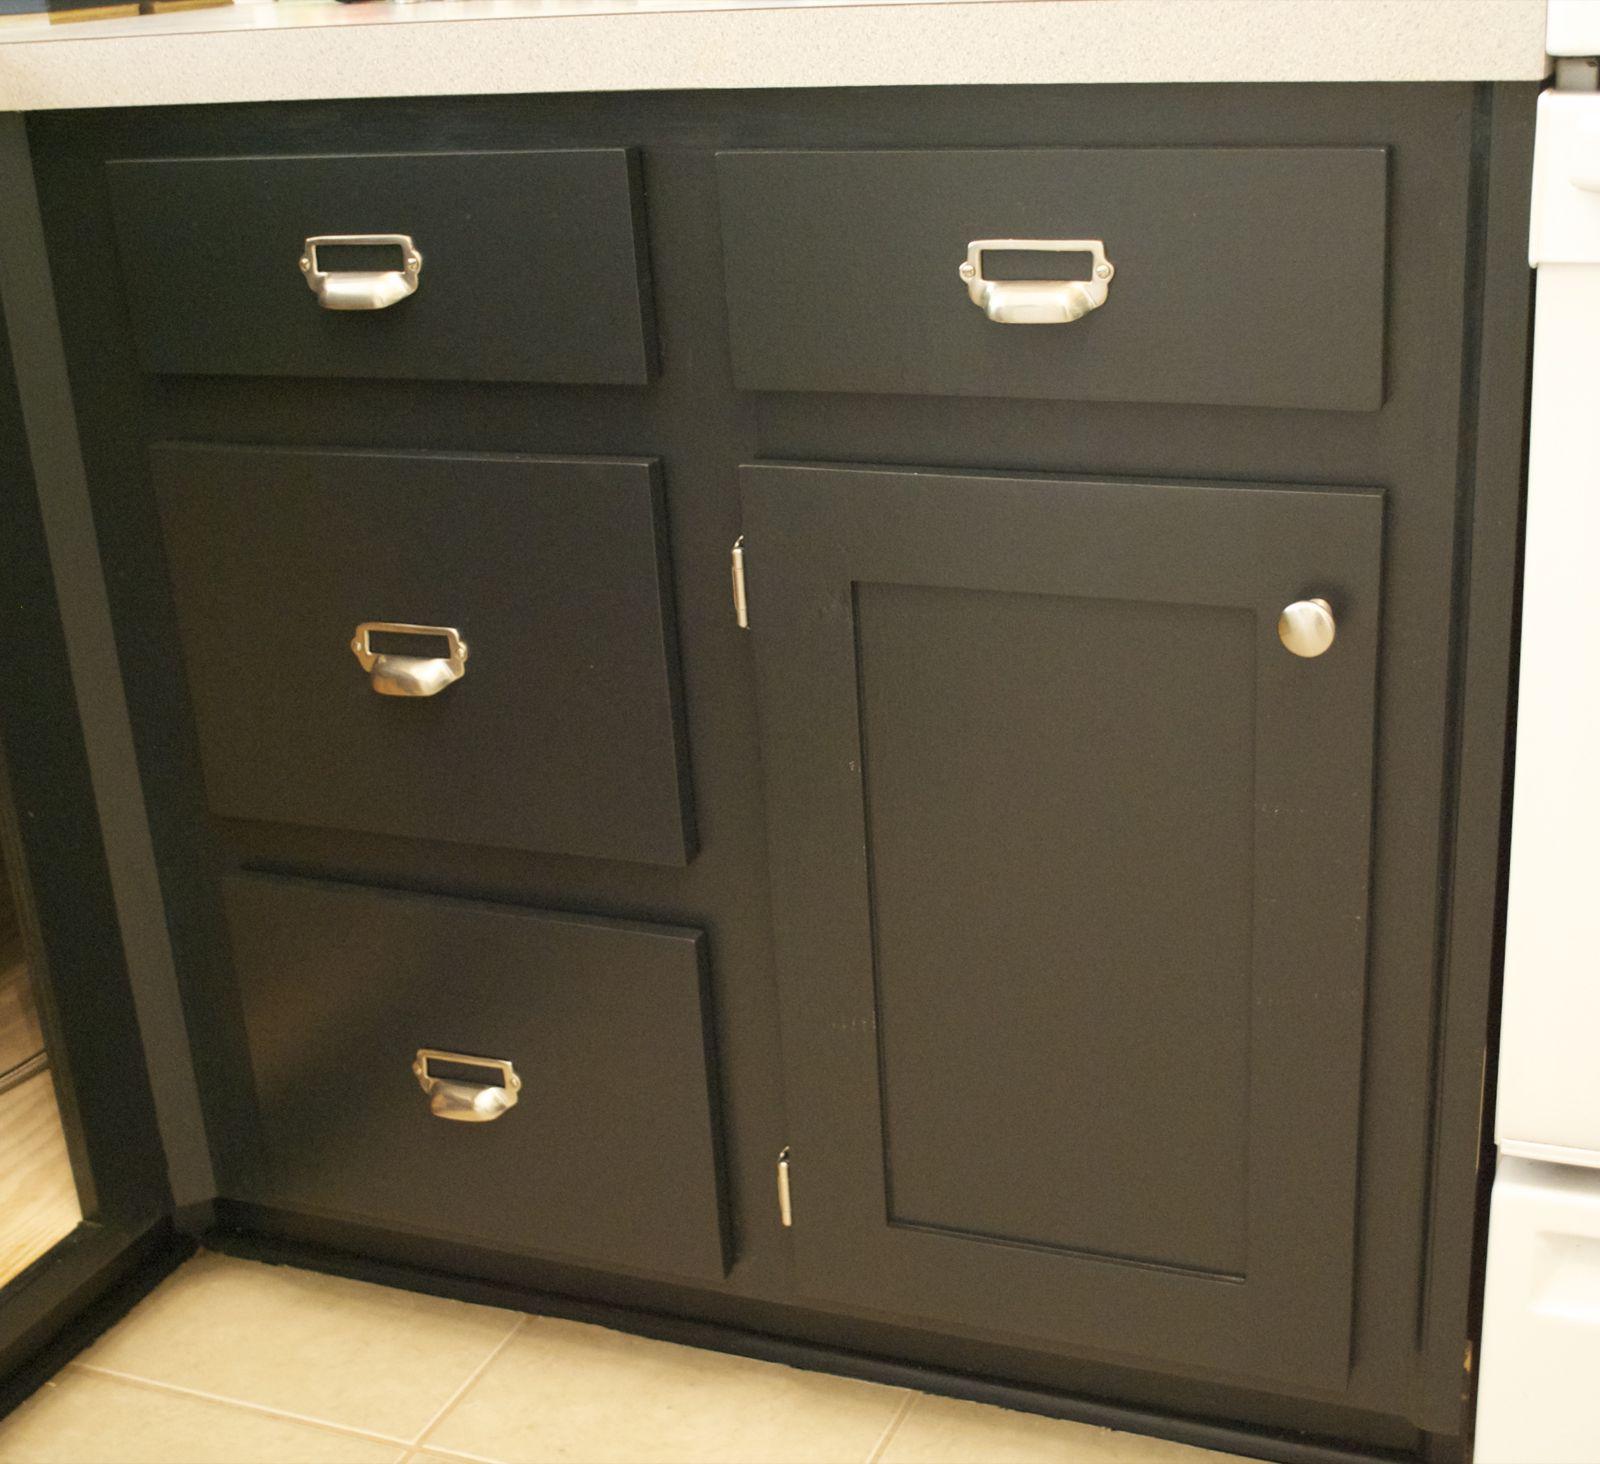 Kitchen Cabinets Doors: Low Country Living: Cabinet Doors